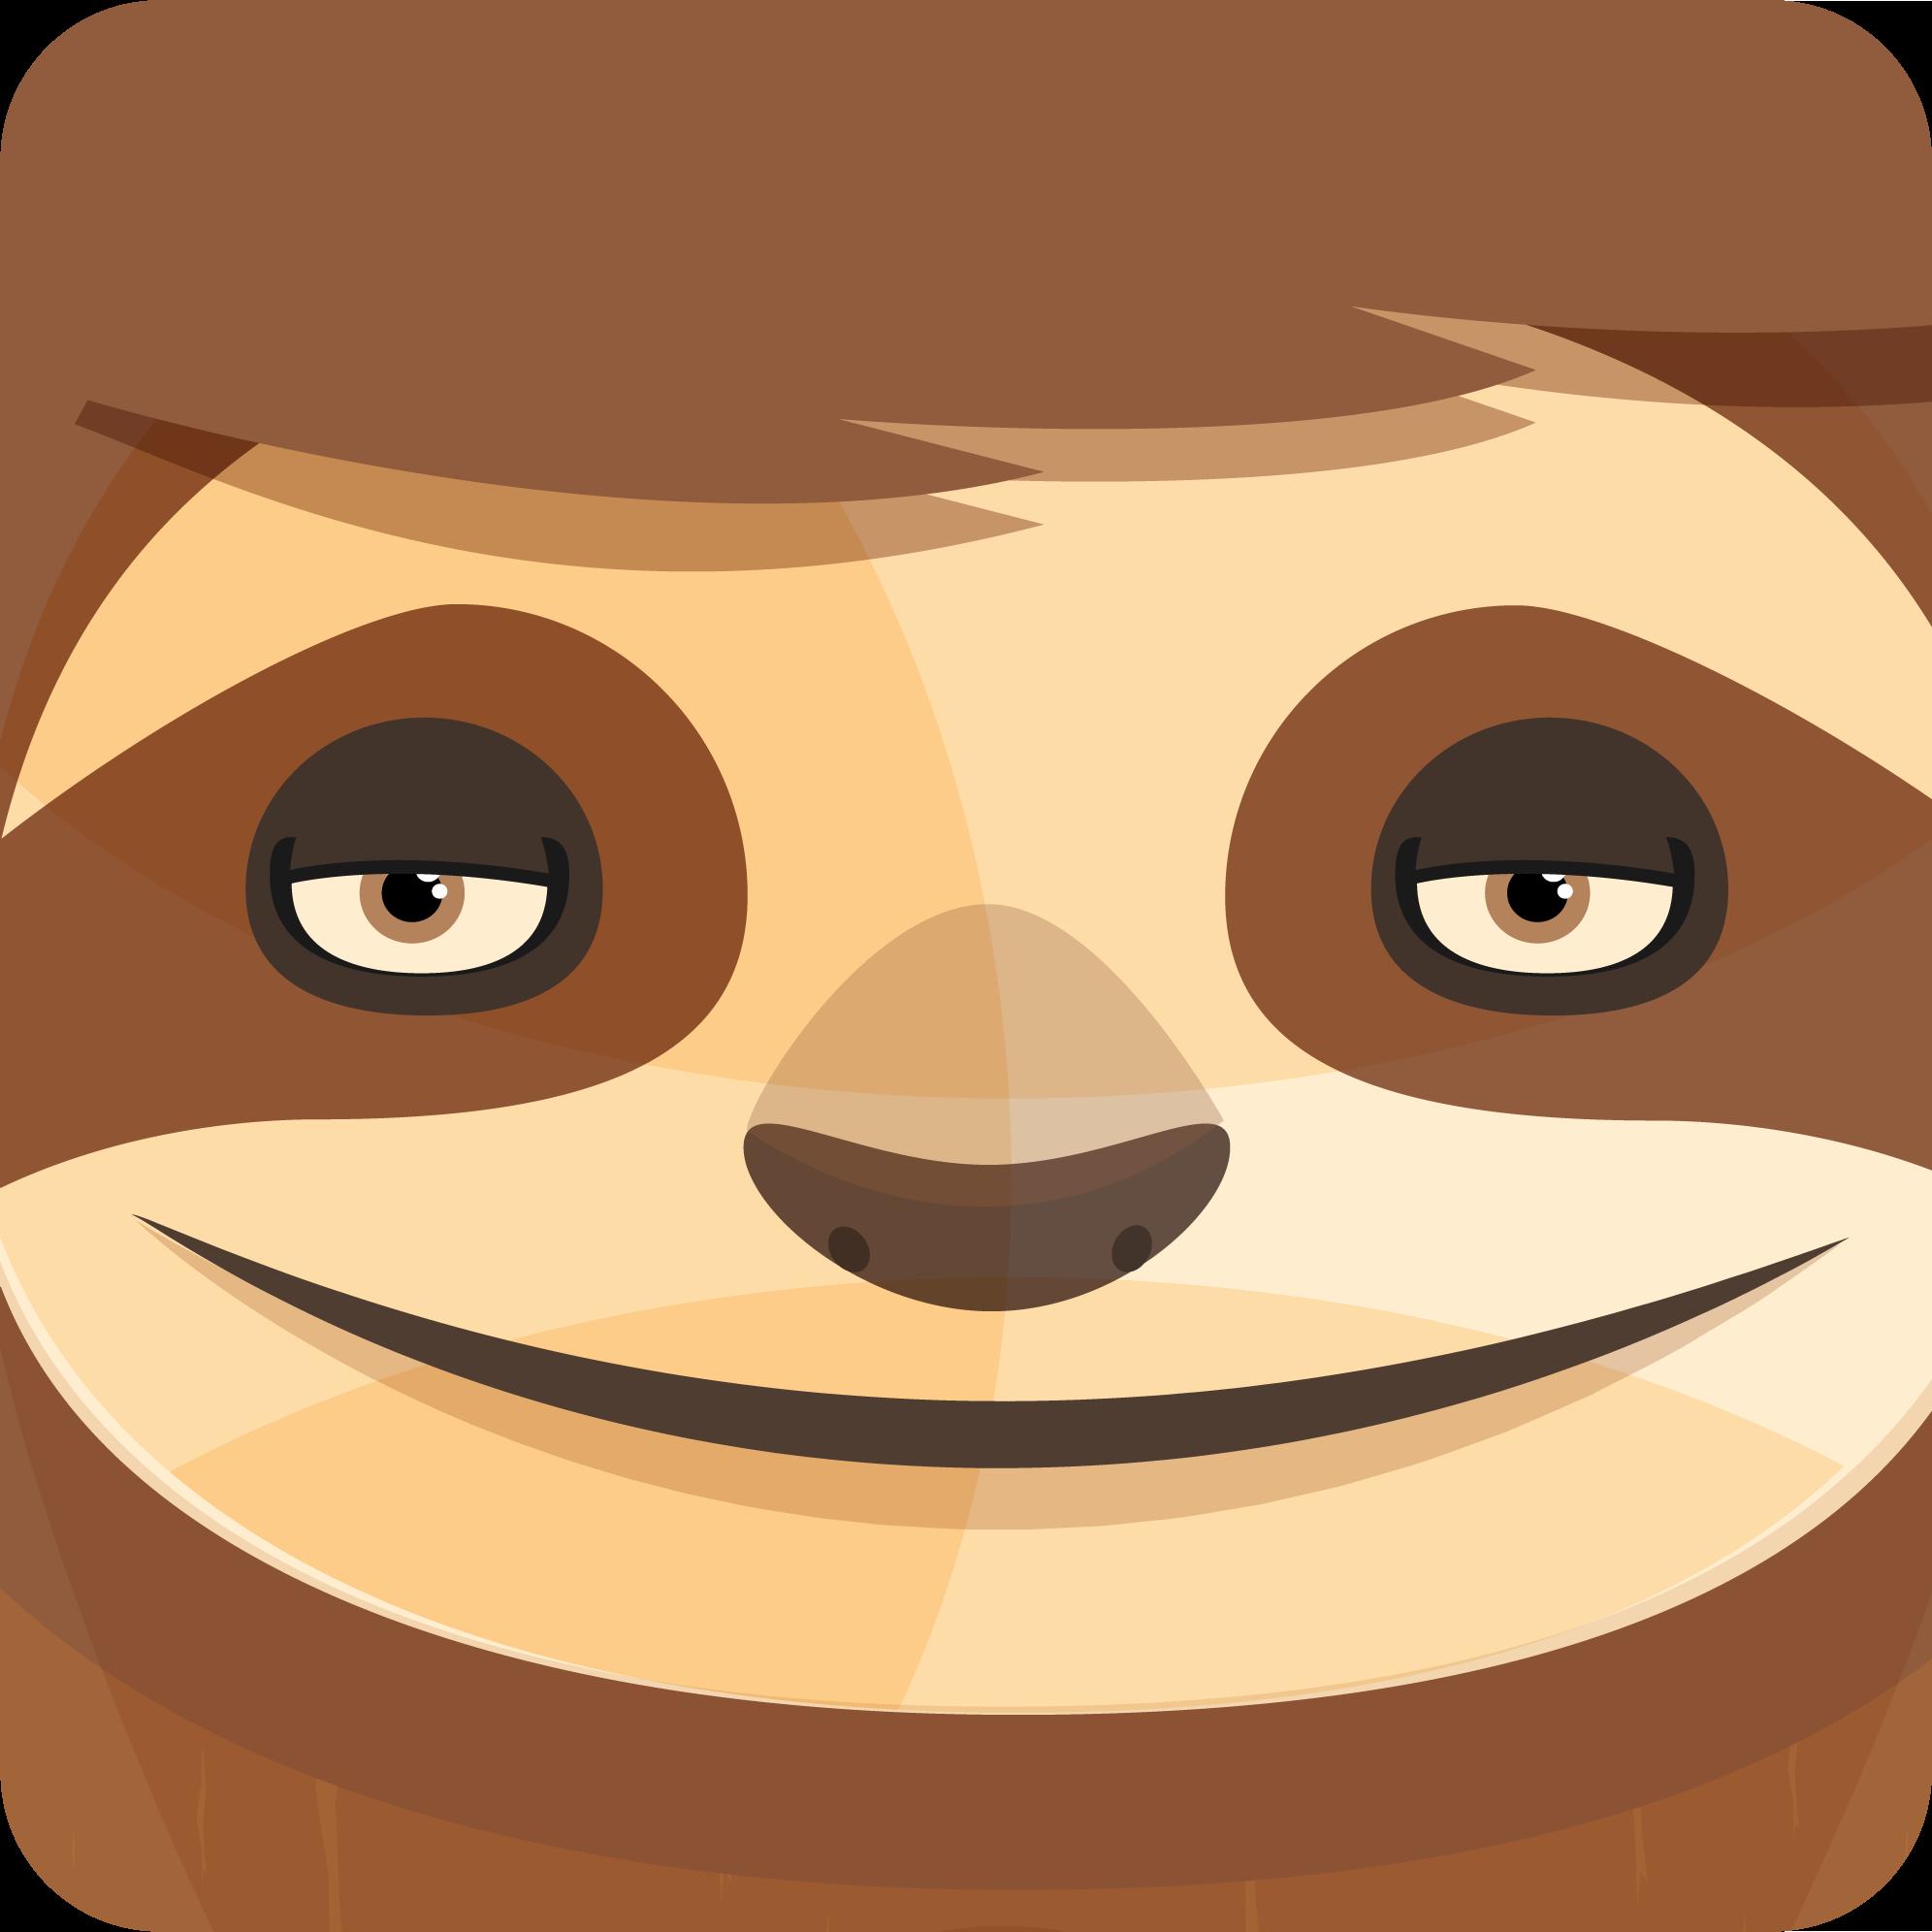 StoryChief